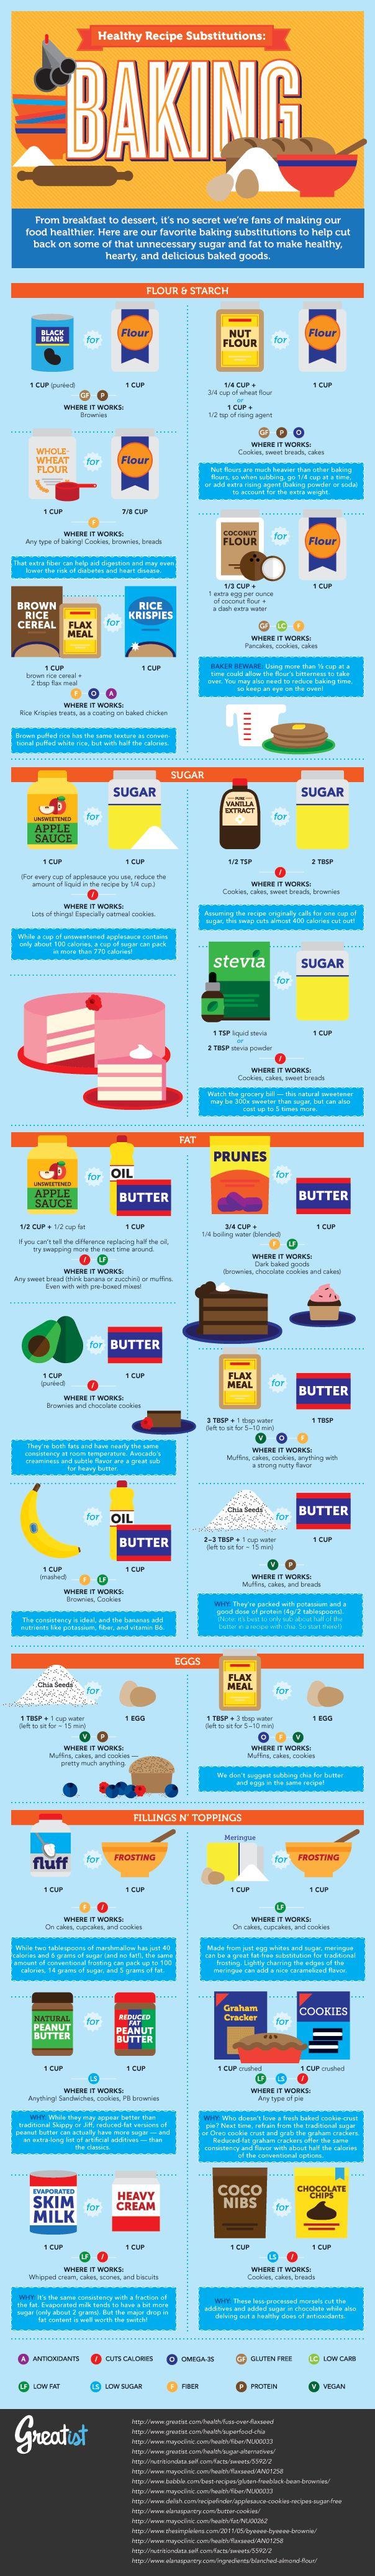 188 best Steamy Kitchen Secrets images on Pinterest | Kitchens ...